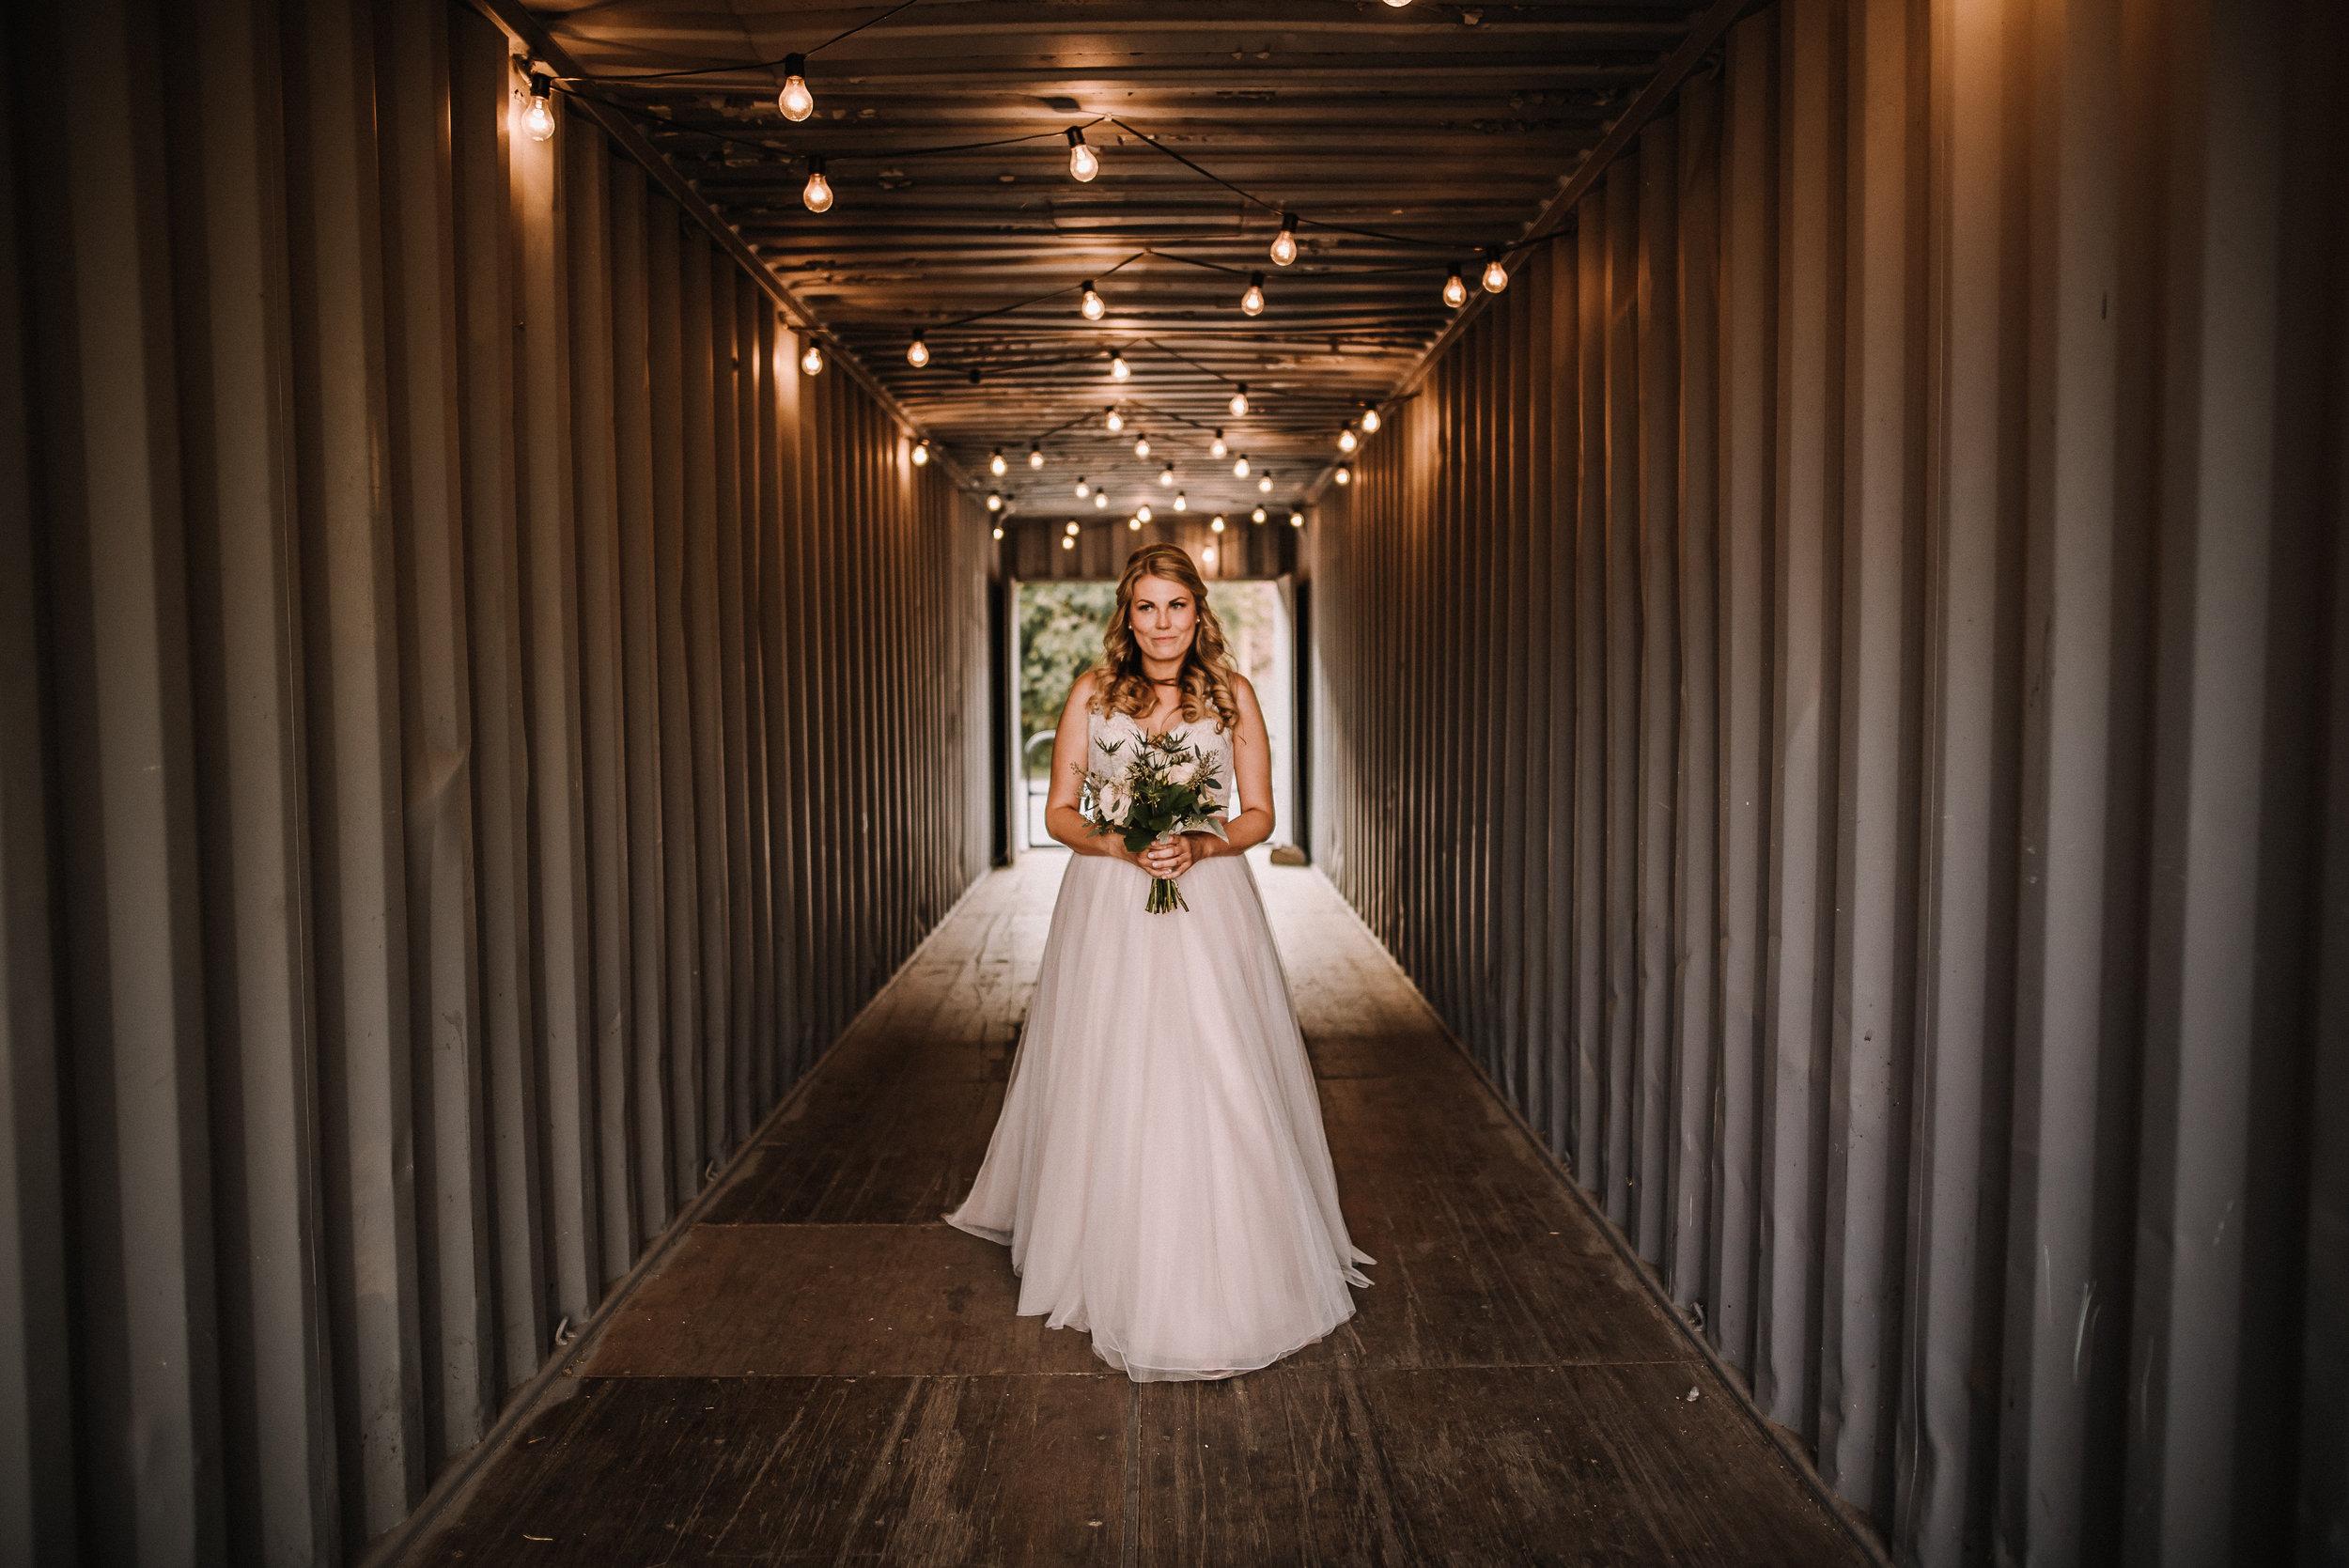 Pearson-Wiseacre-Wedding_Ashley-Benham-Photography (182 of 633).jpg